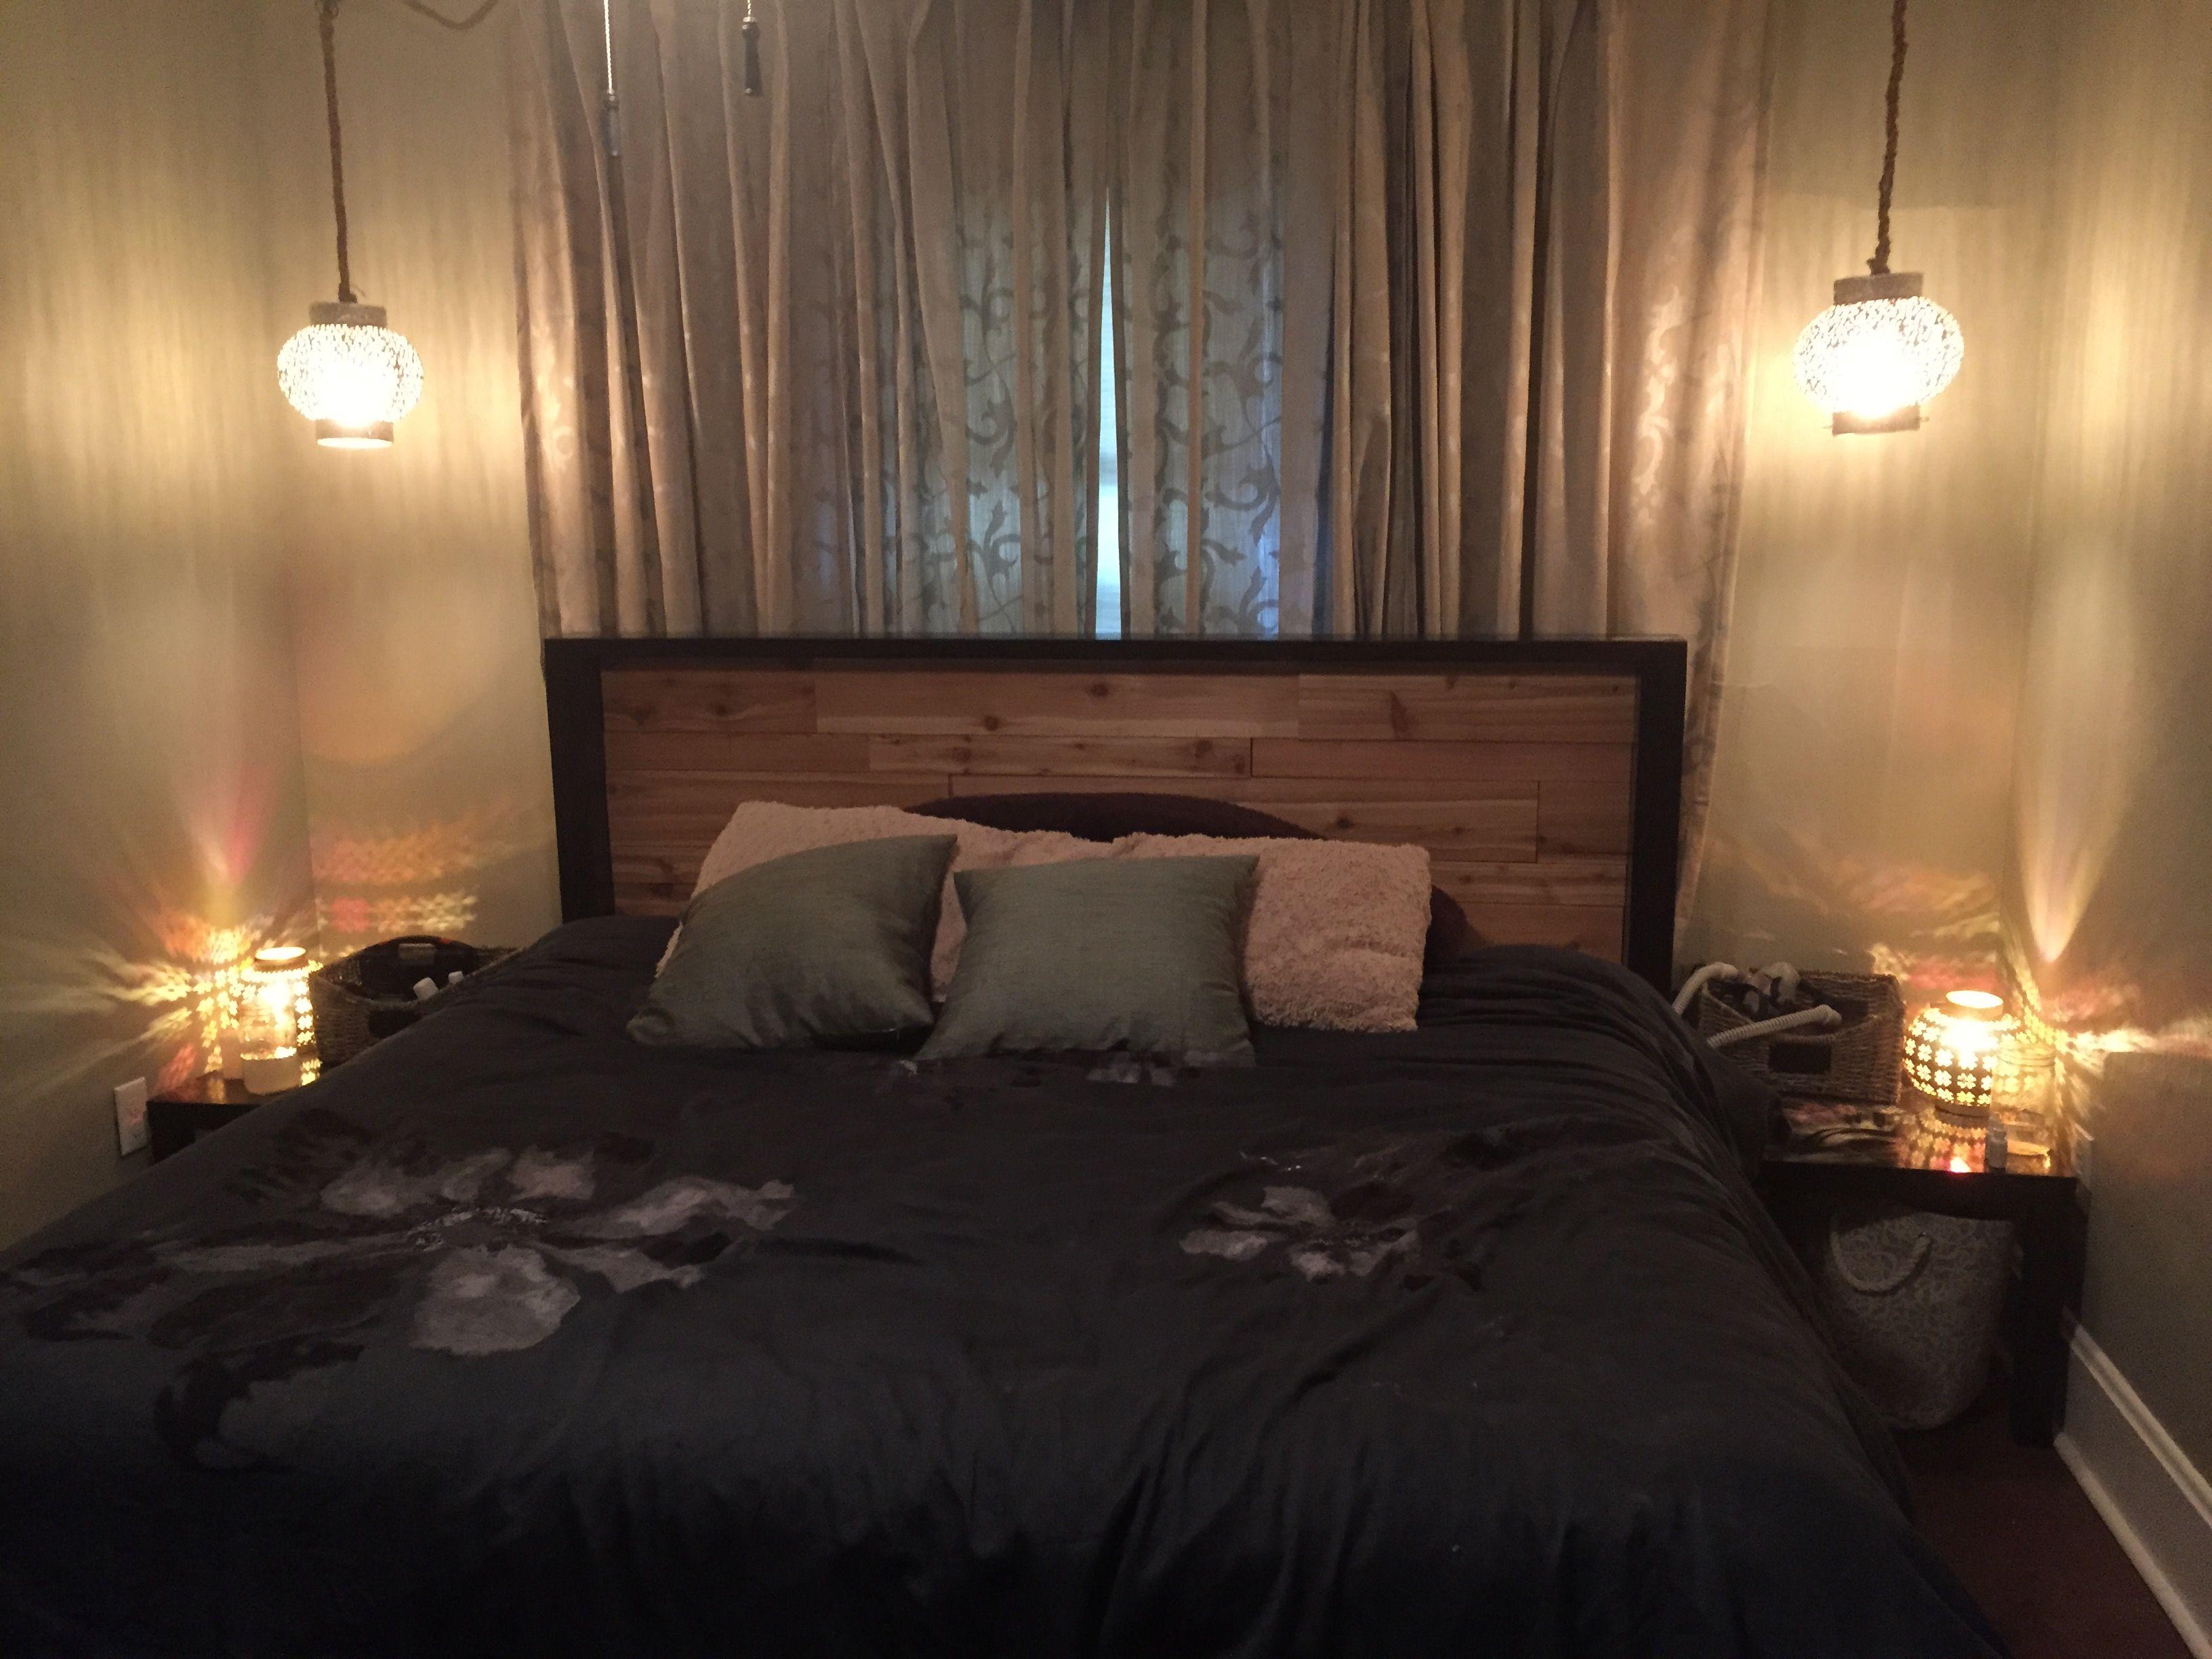 New In The Bedroom The Bedroom Is Done The Handmade Cedar Headboard And Bedframe